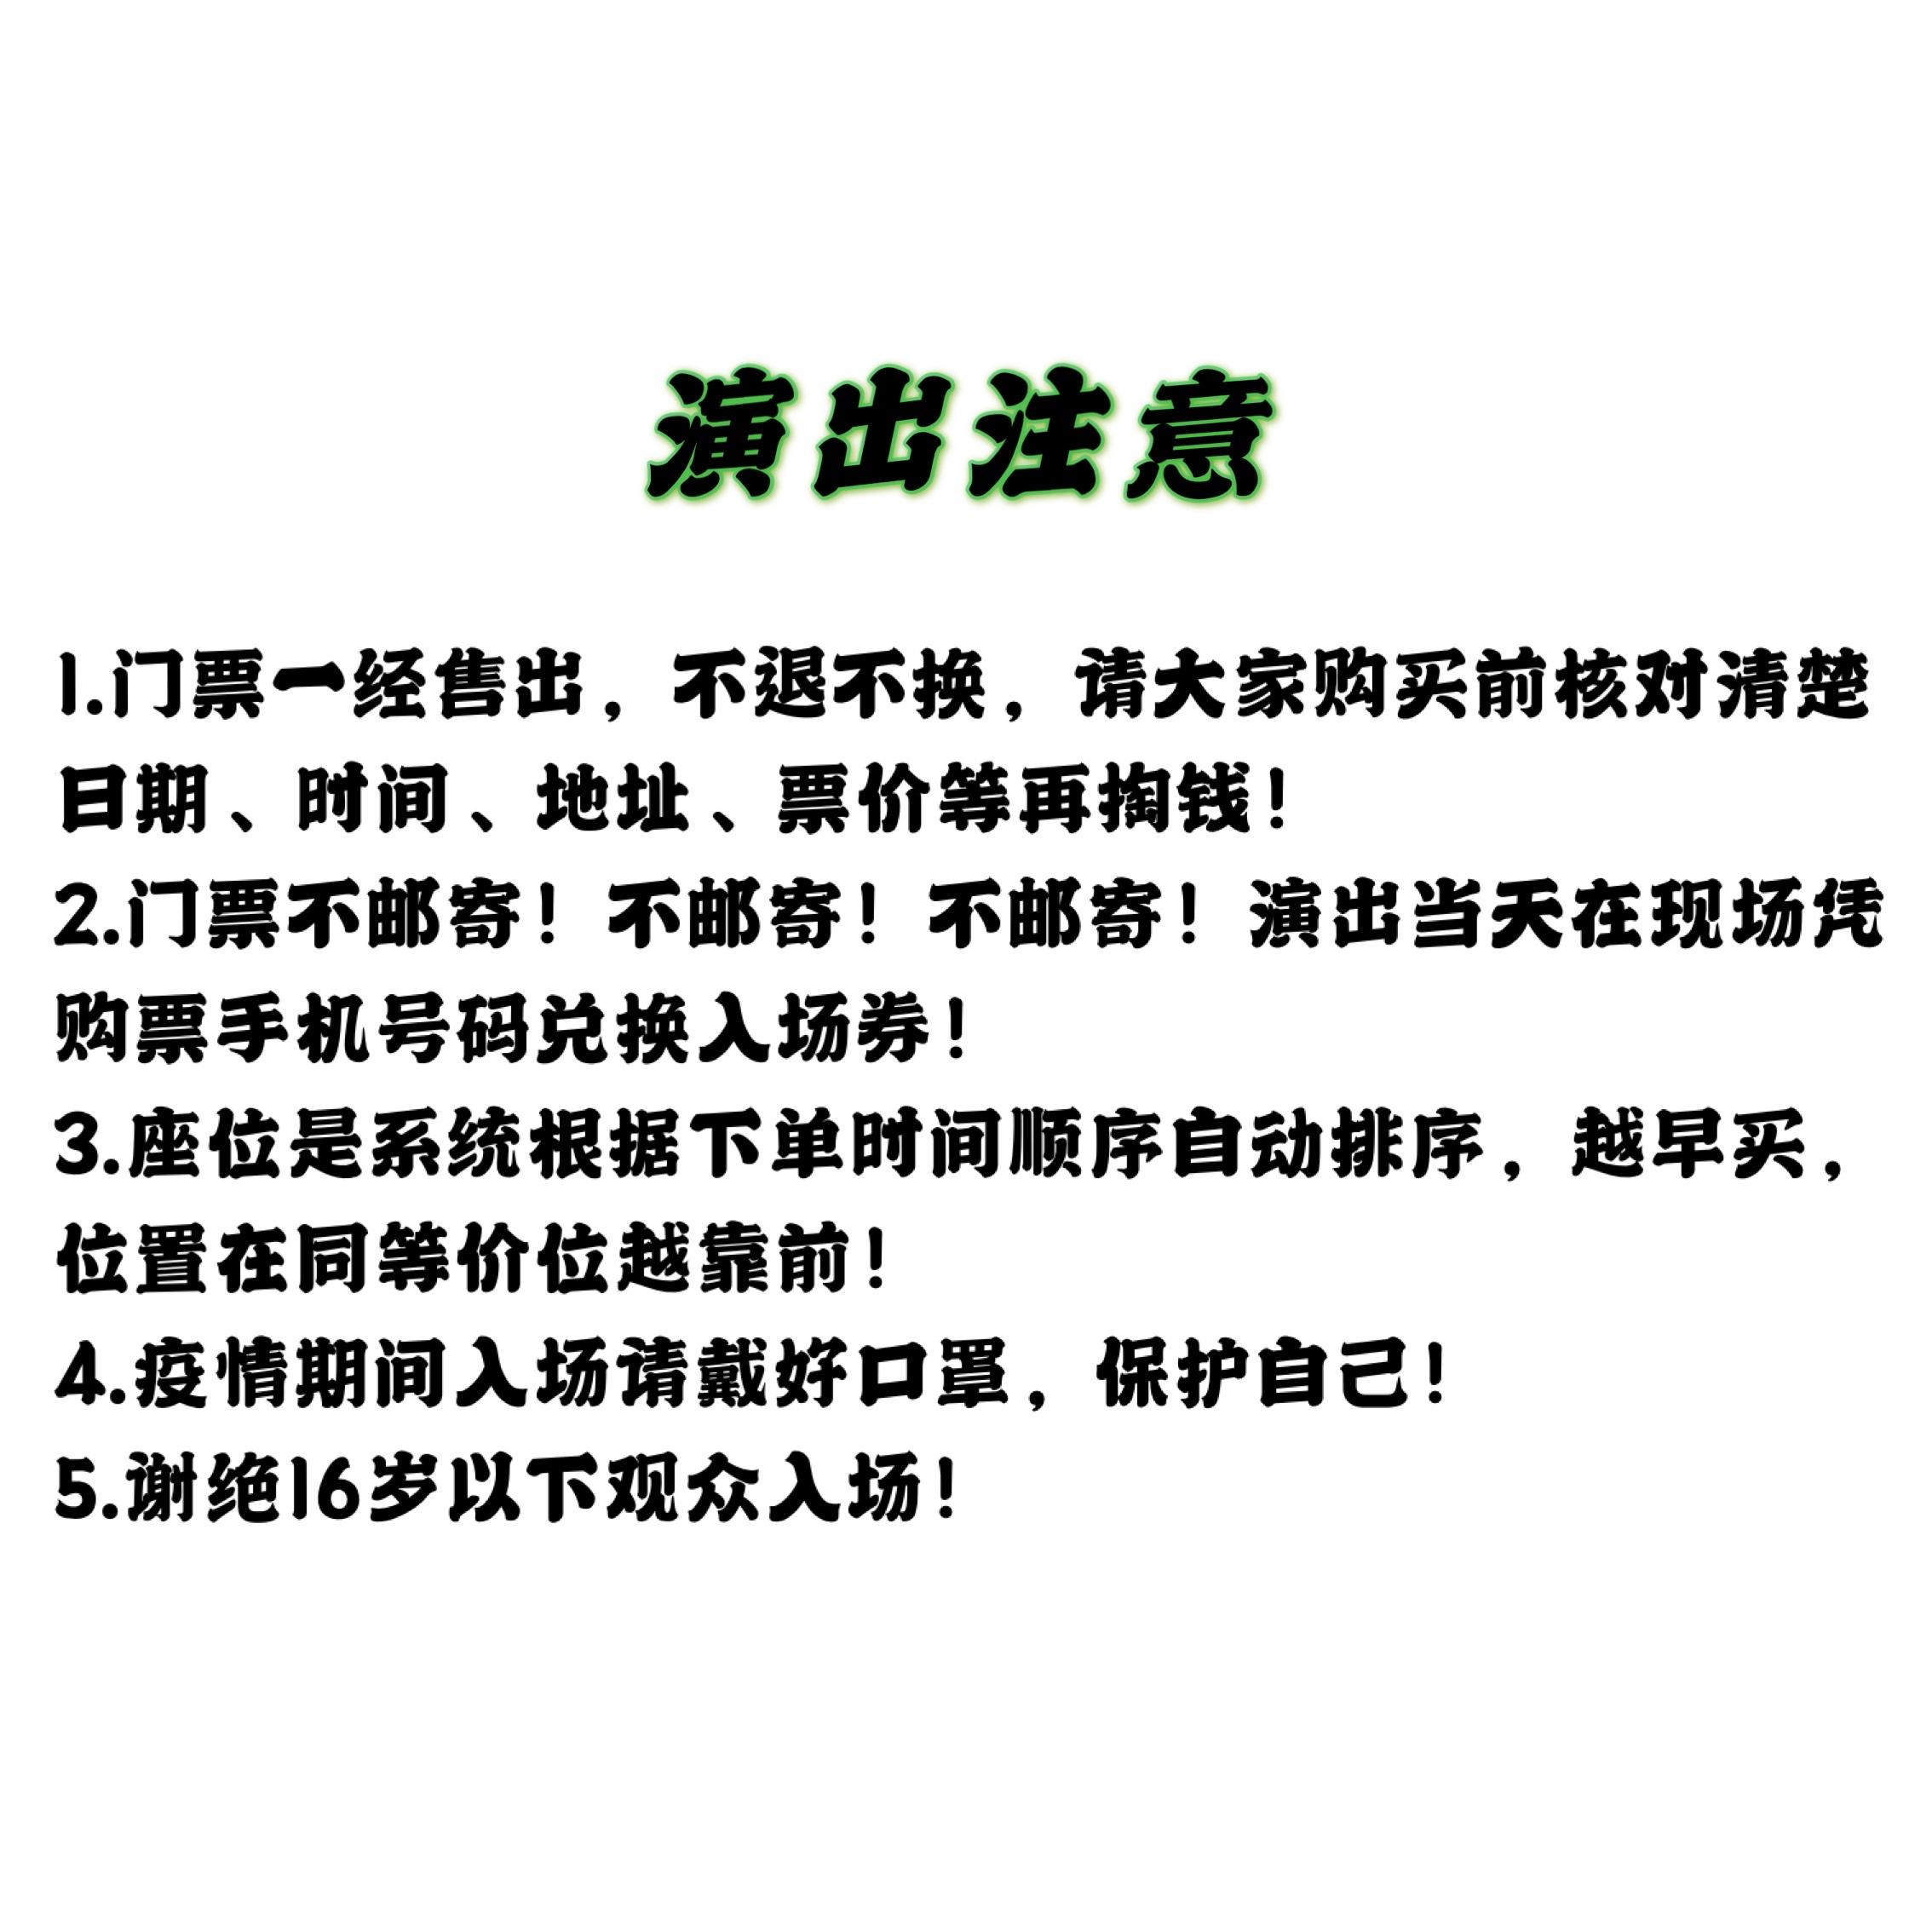 2021《Xin仇旧恨》小Xin脱口秀最新个人专场—北京站